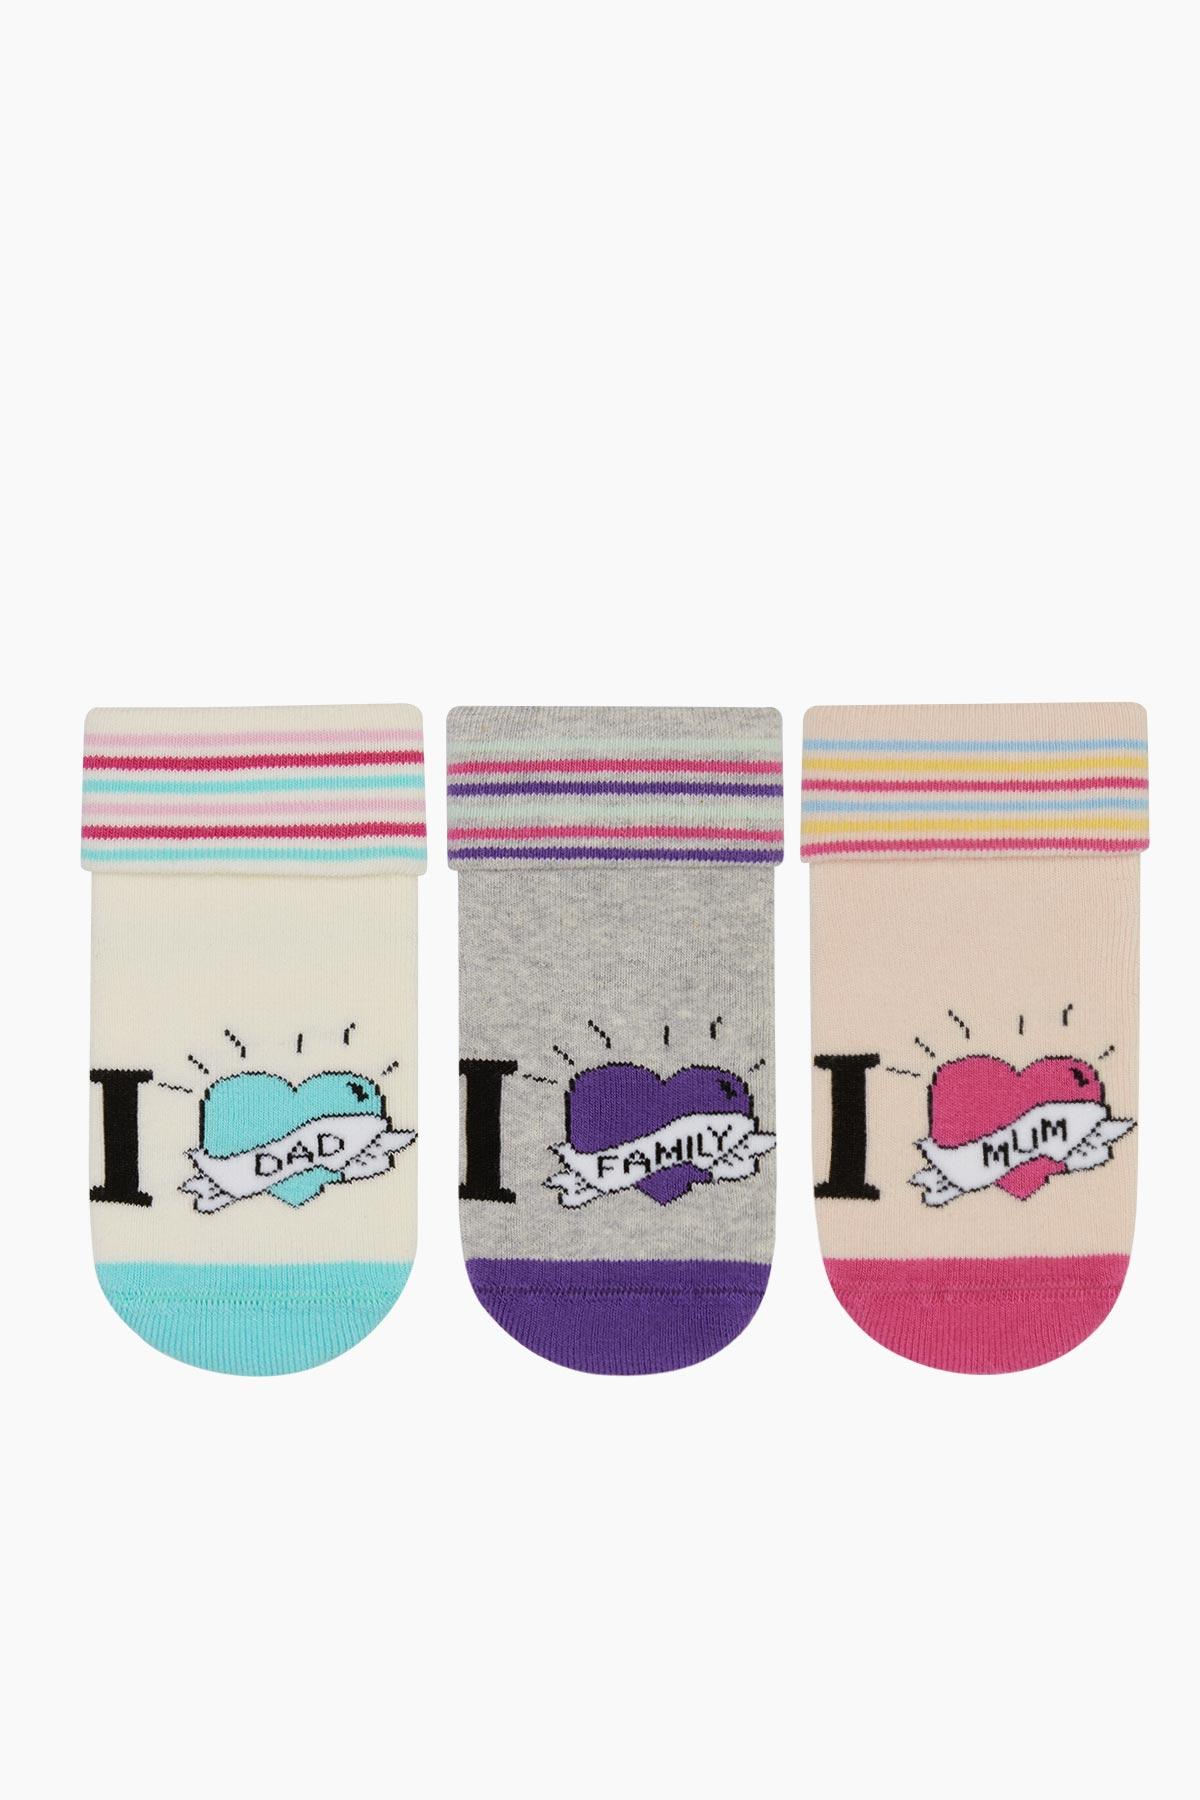 Bross - Bross 3 Pieces I Family Circle Towel Baby Socks